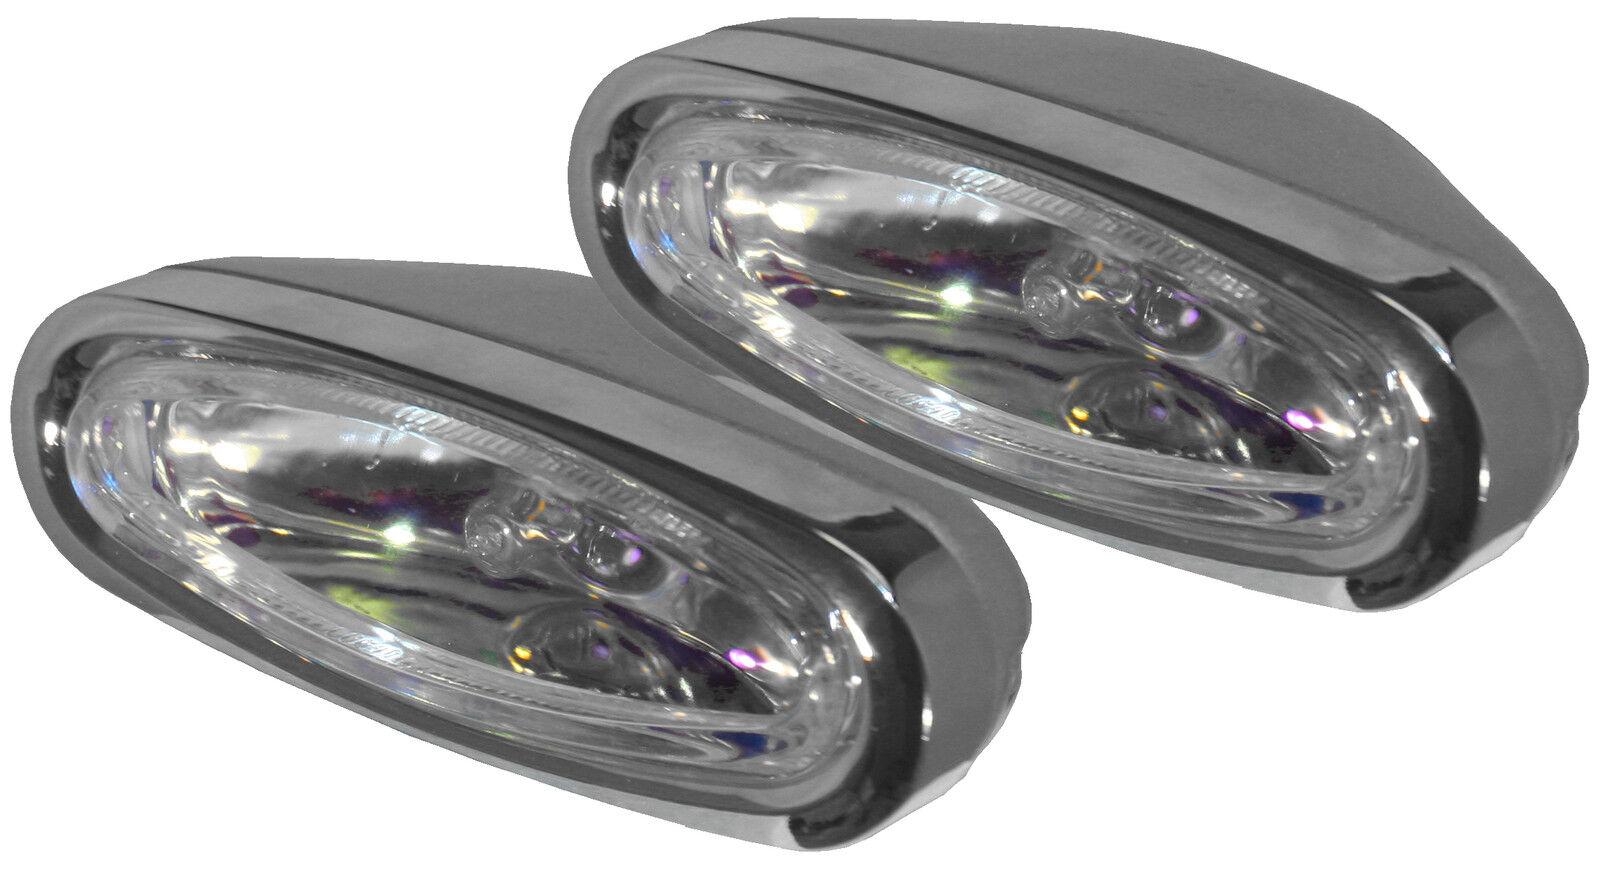 universal 5 u0026quot  oval fog lights driving lamps w   wiring kit